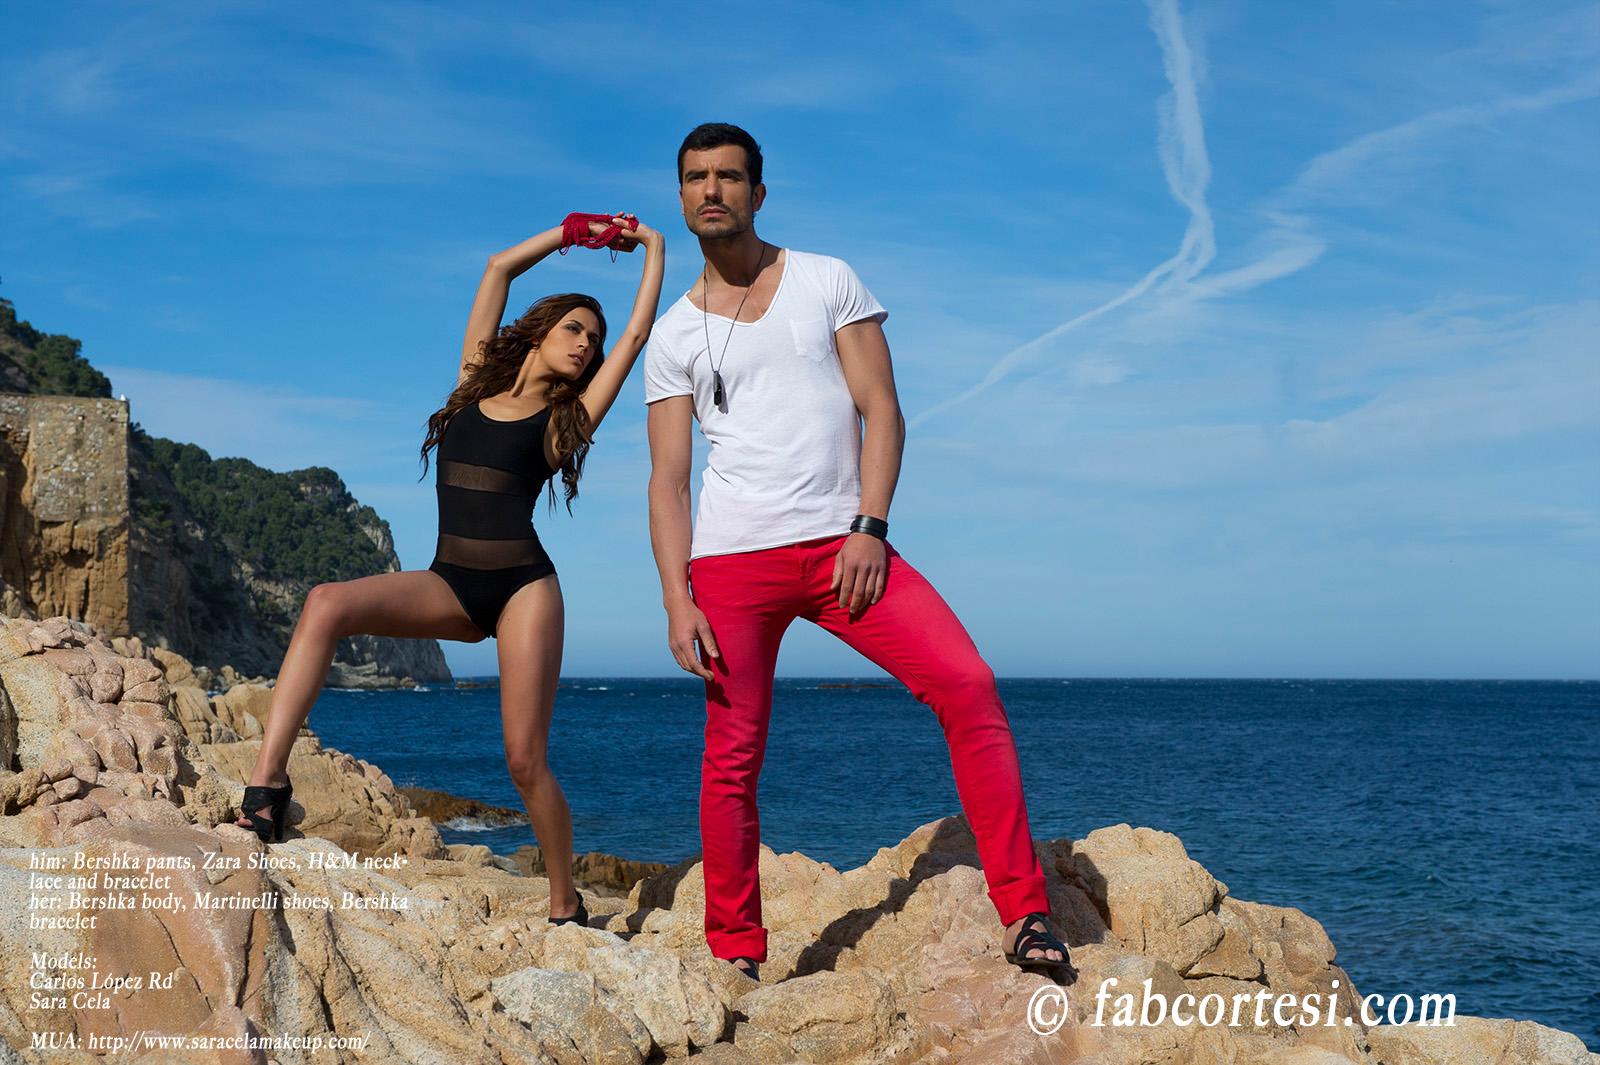 him: Bershka pants, Zara Shoes, H&M necklace and bracelether: Bershka body, Martinelli shoes, Bershka braceletModels: Carlos López RdSara CelaMUA: http://www.saracelamakeup.com/